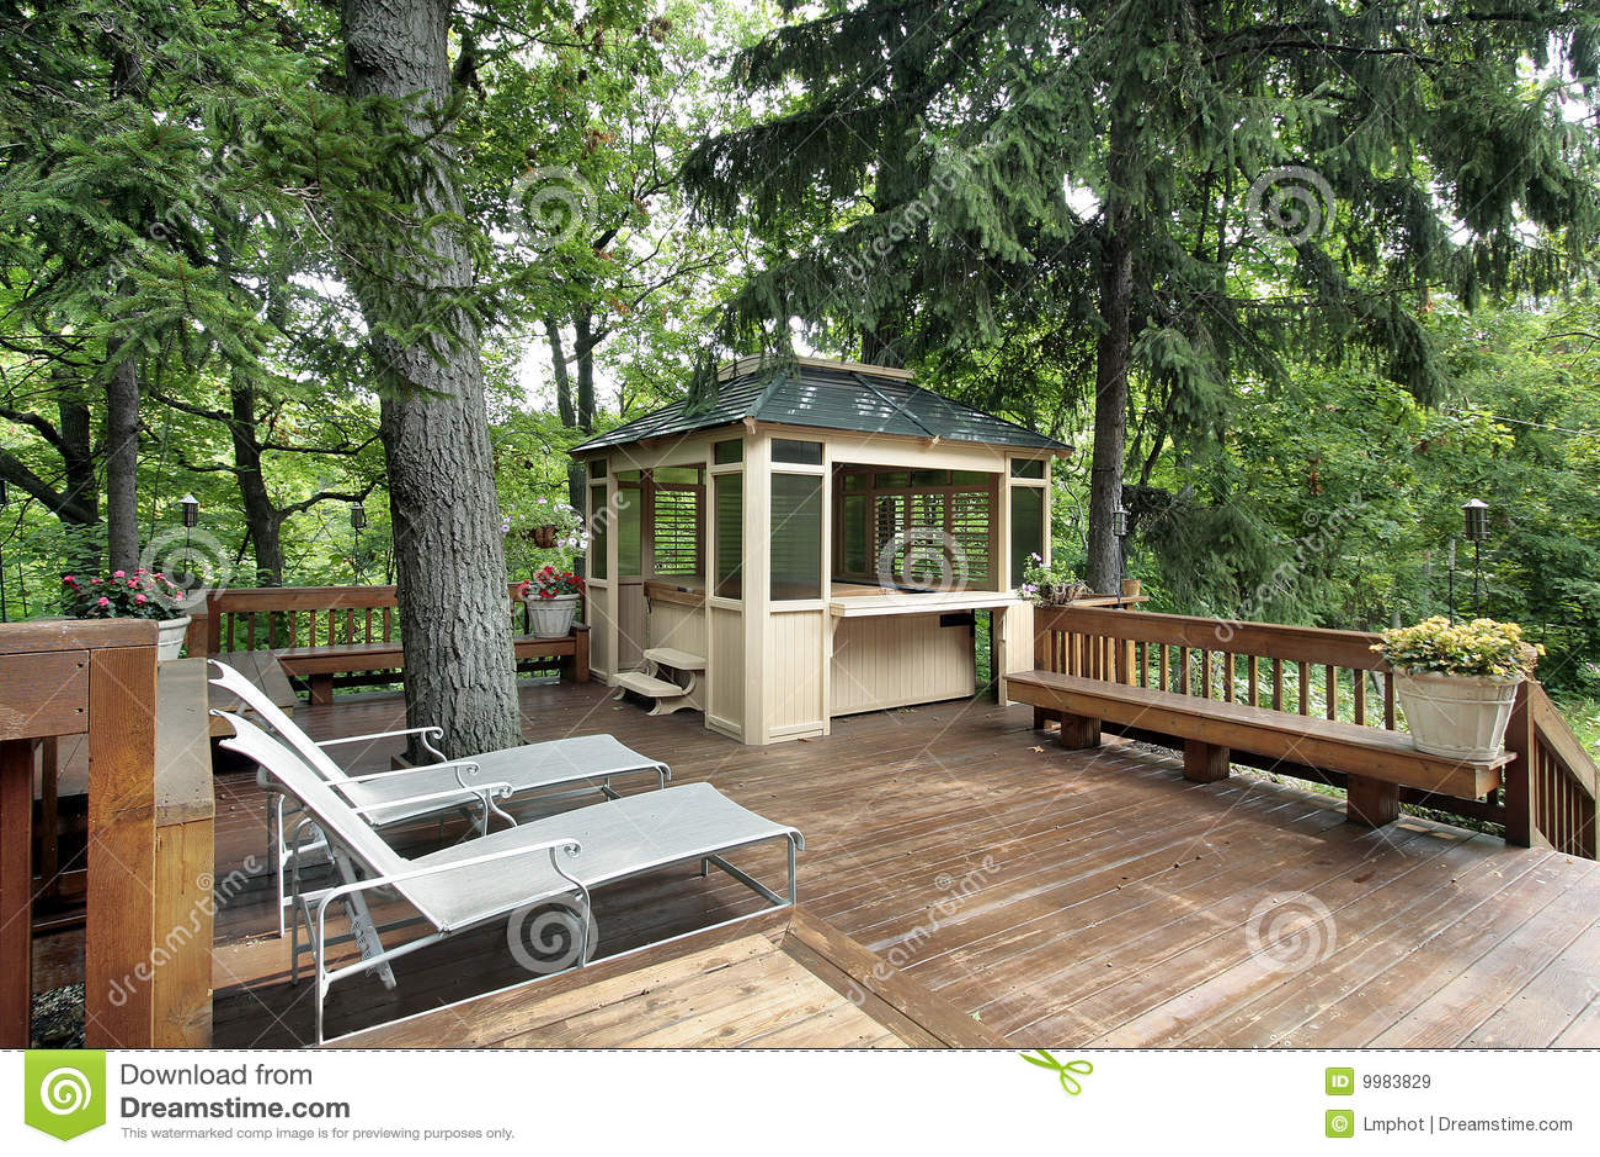 Wood deck in luxury home